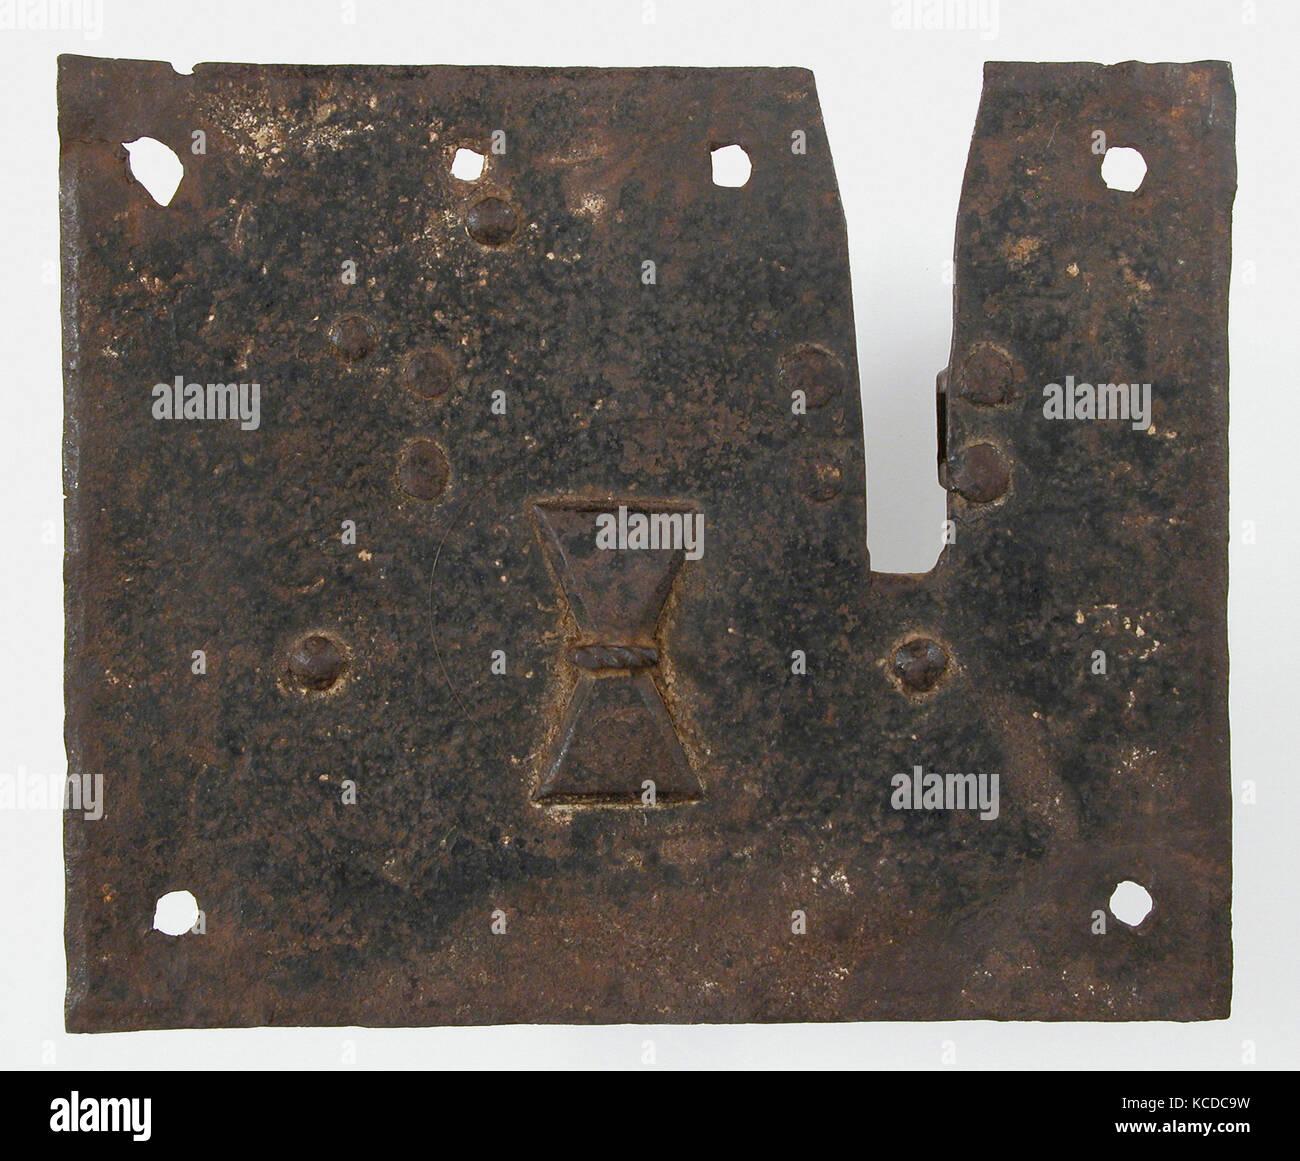 Lock, 16th century, Italian, Iron, Overall: 5 11/16 x 6 15/16 x 2 1/2 in. (14.5 x 17.6 x 6.3 cm), Metalwork-Iron Stock Photo